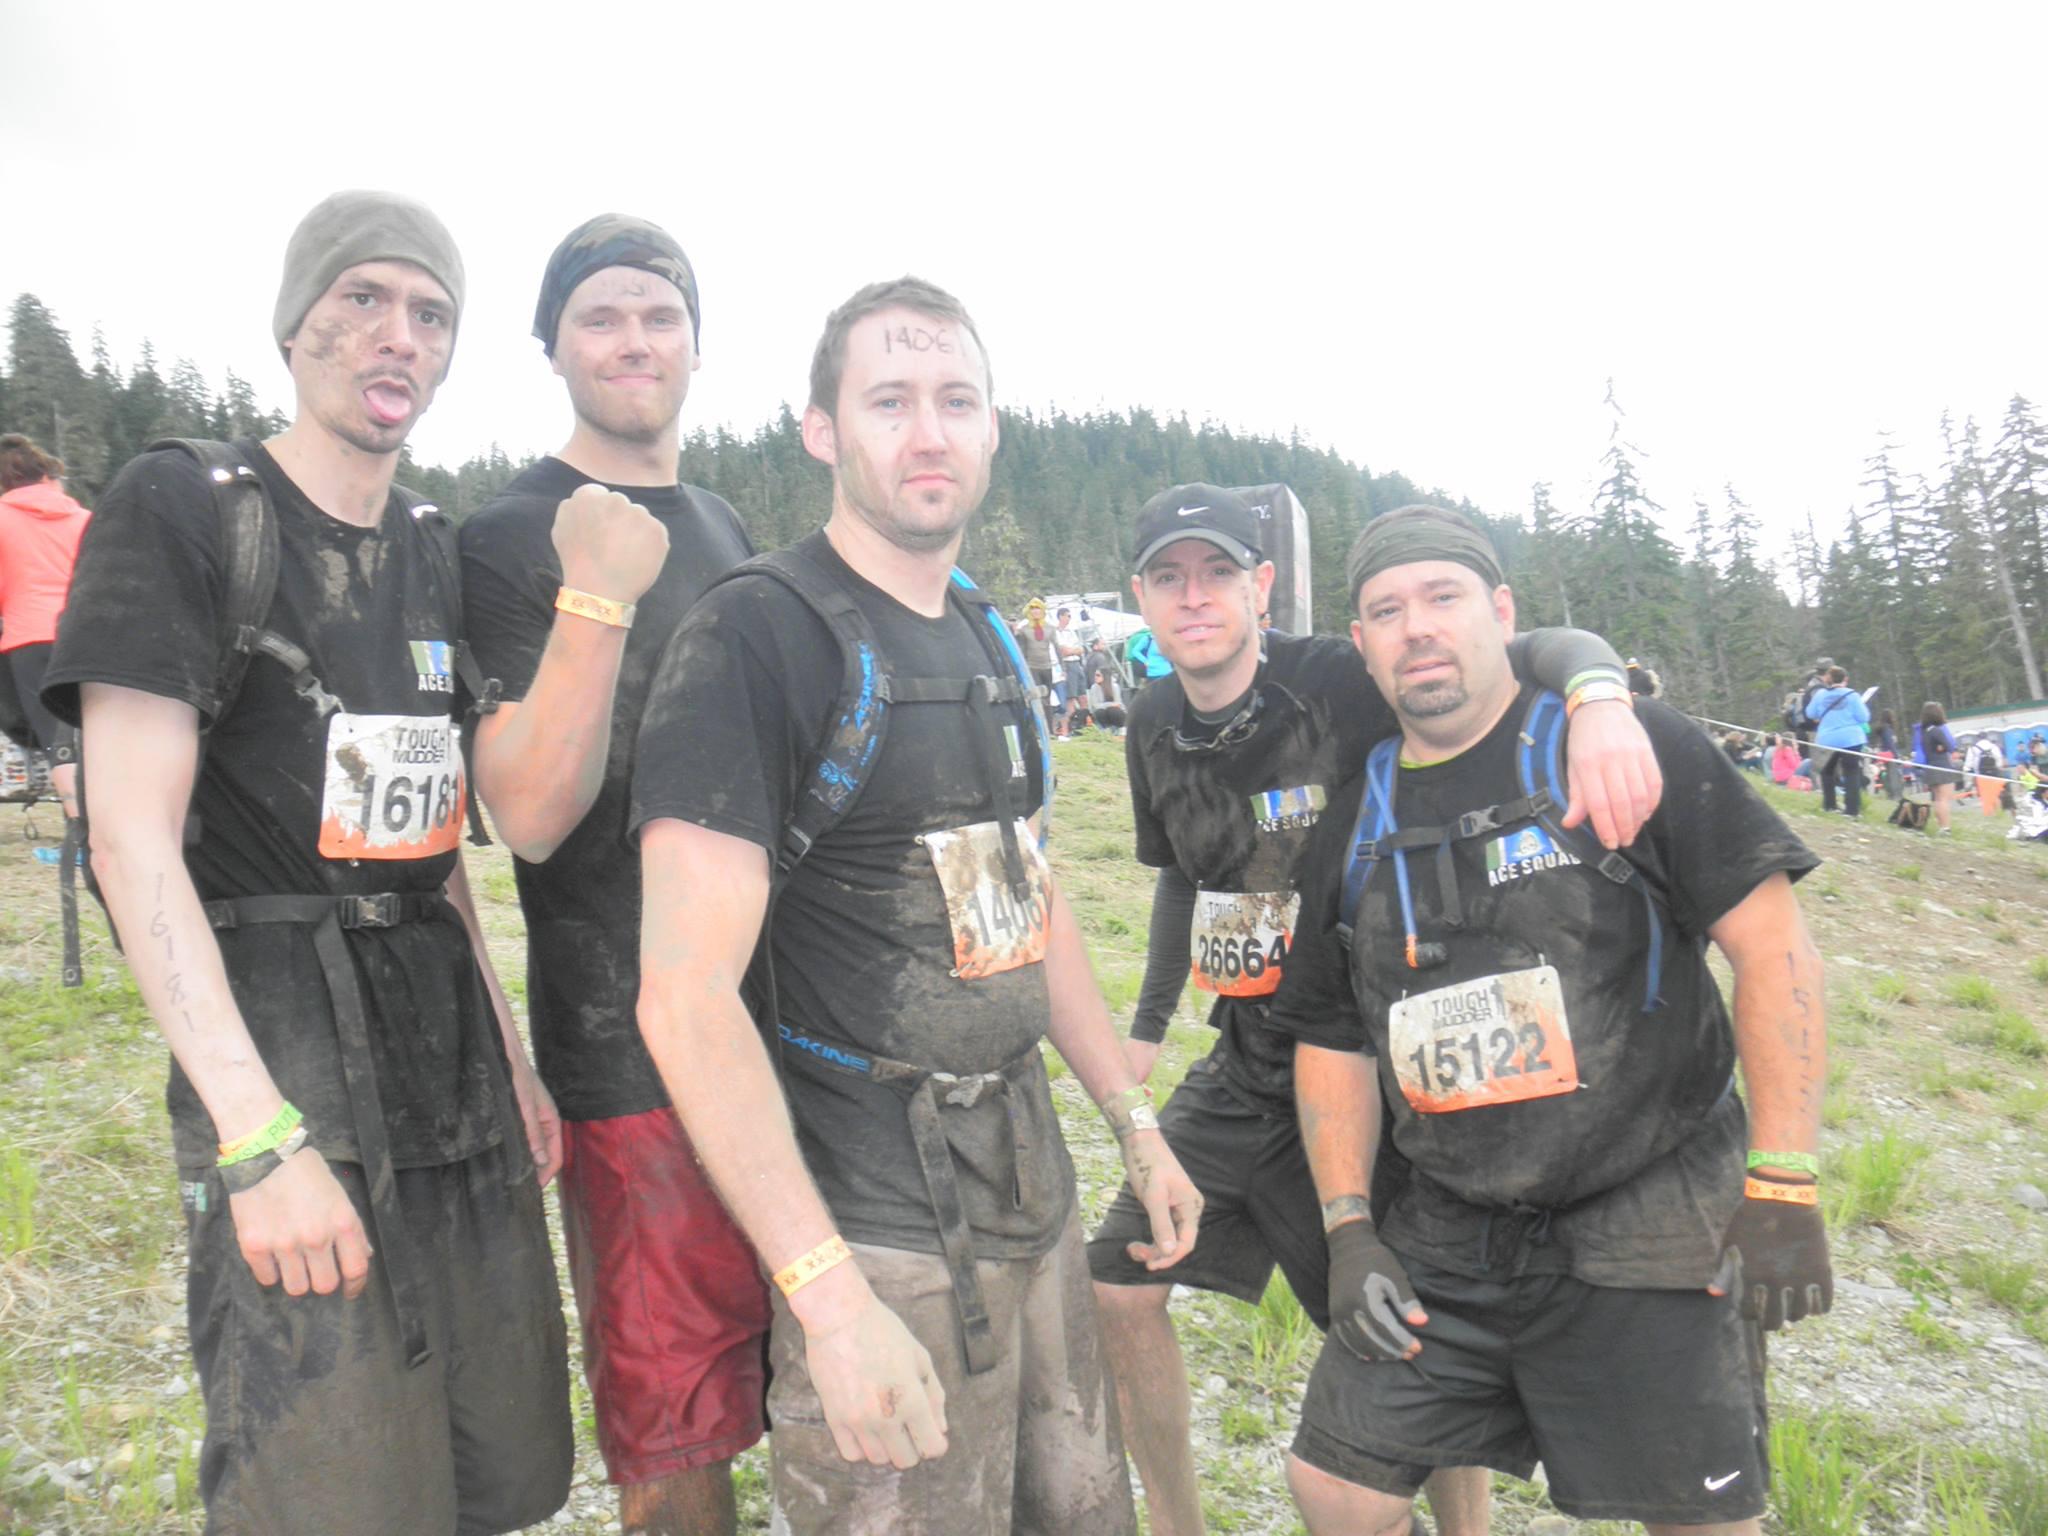 Dave Bone with his Tough Mudder team